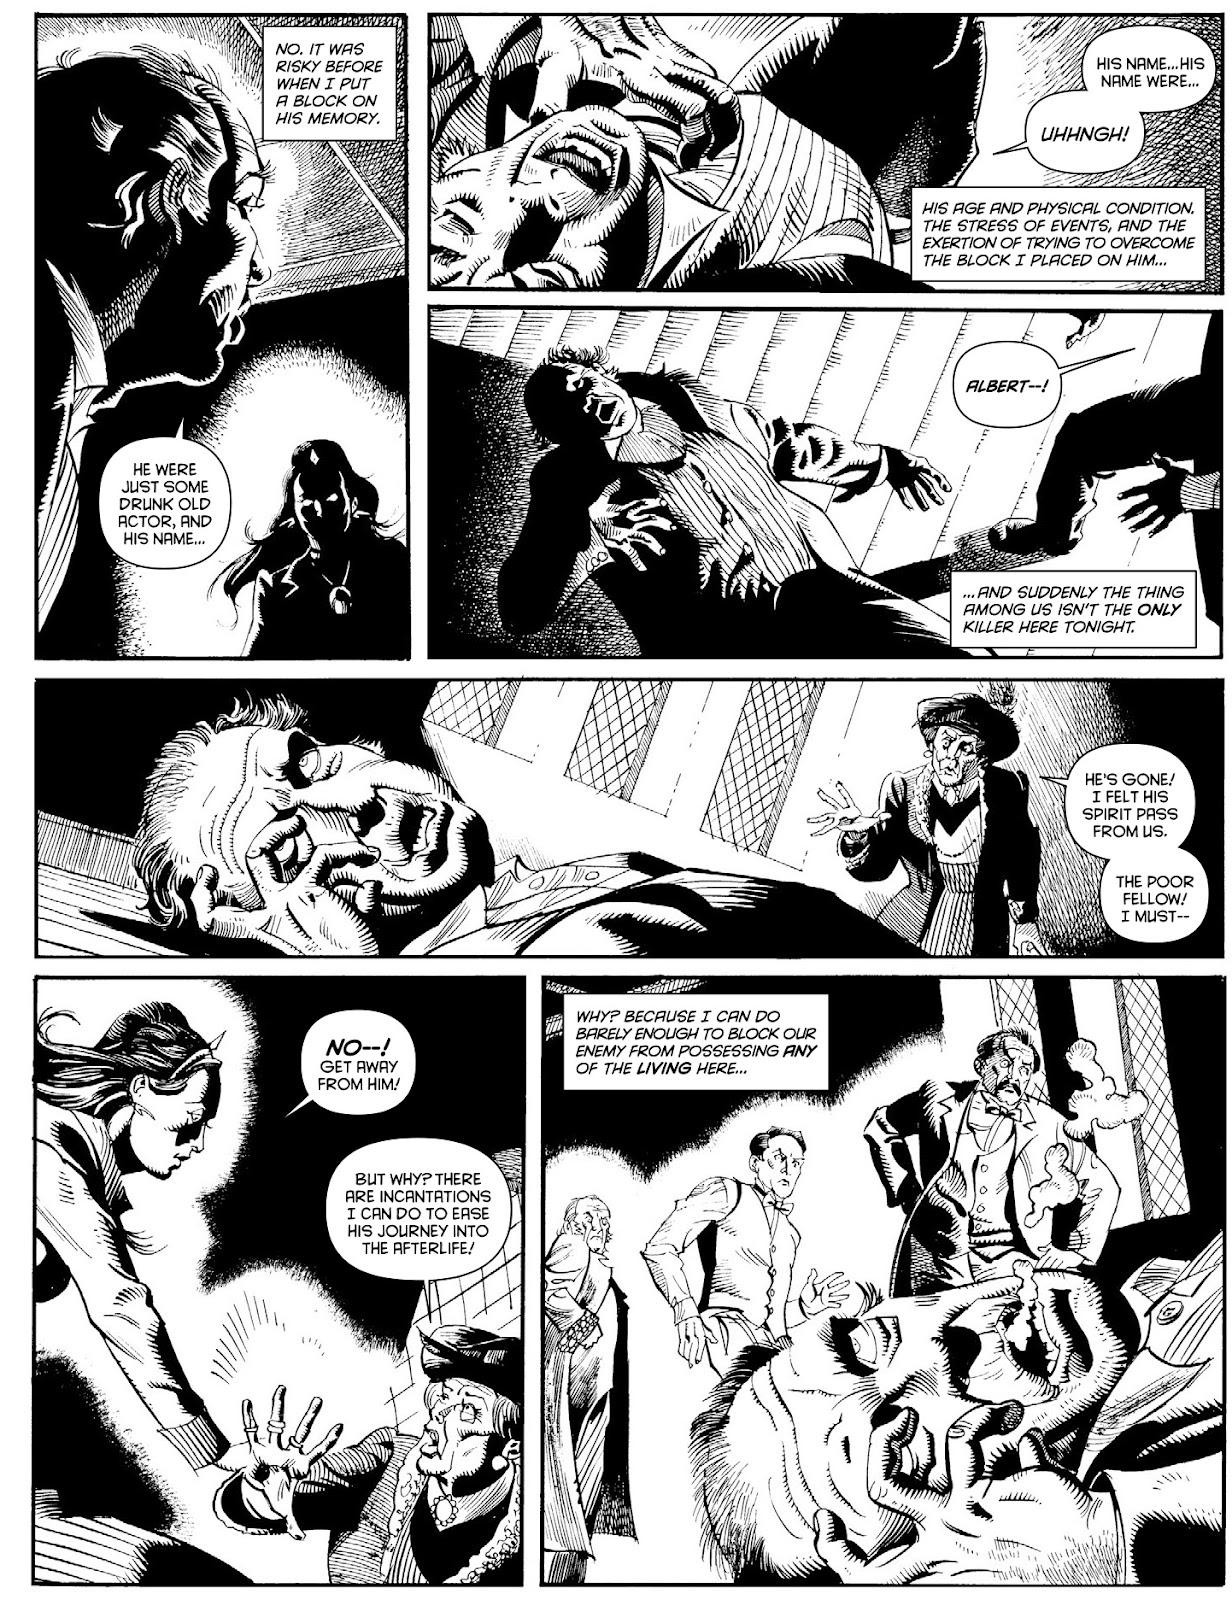 Judge Dredd Megazine (Vol. 5) issue 427 - Page 96